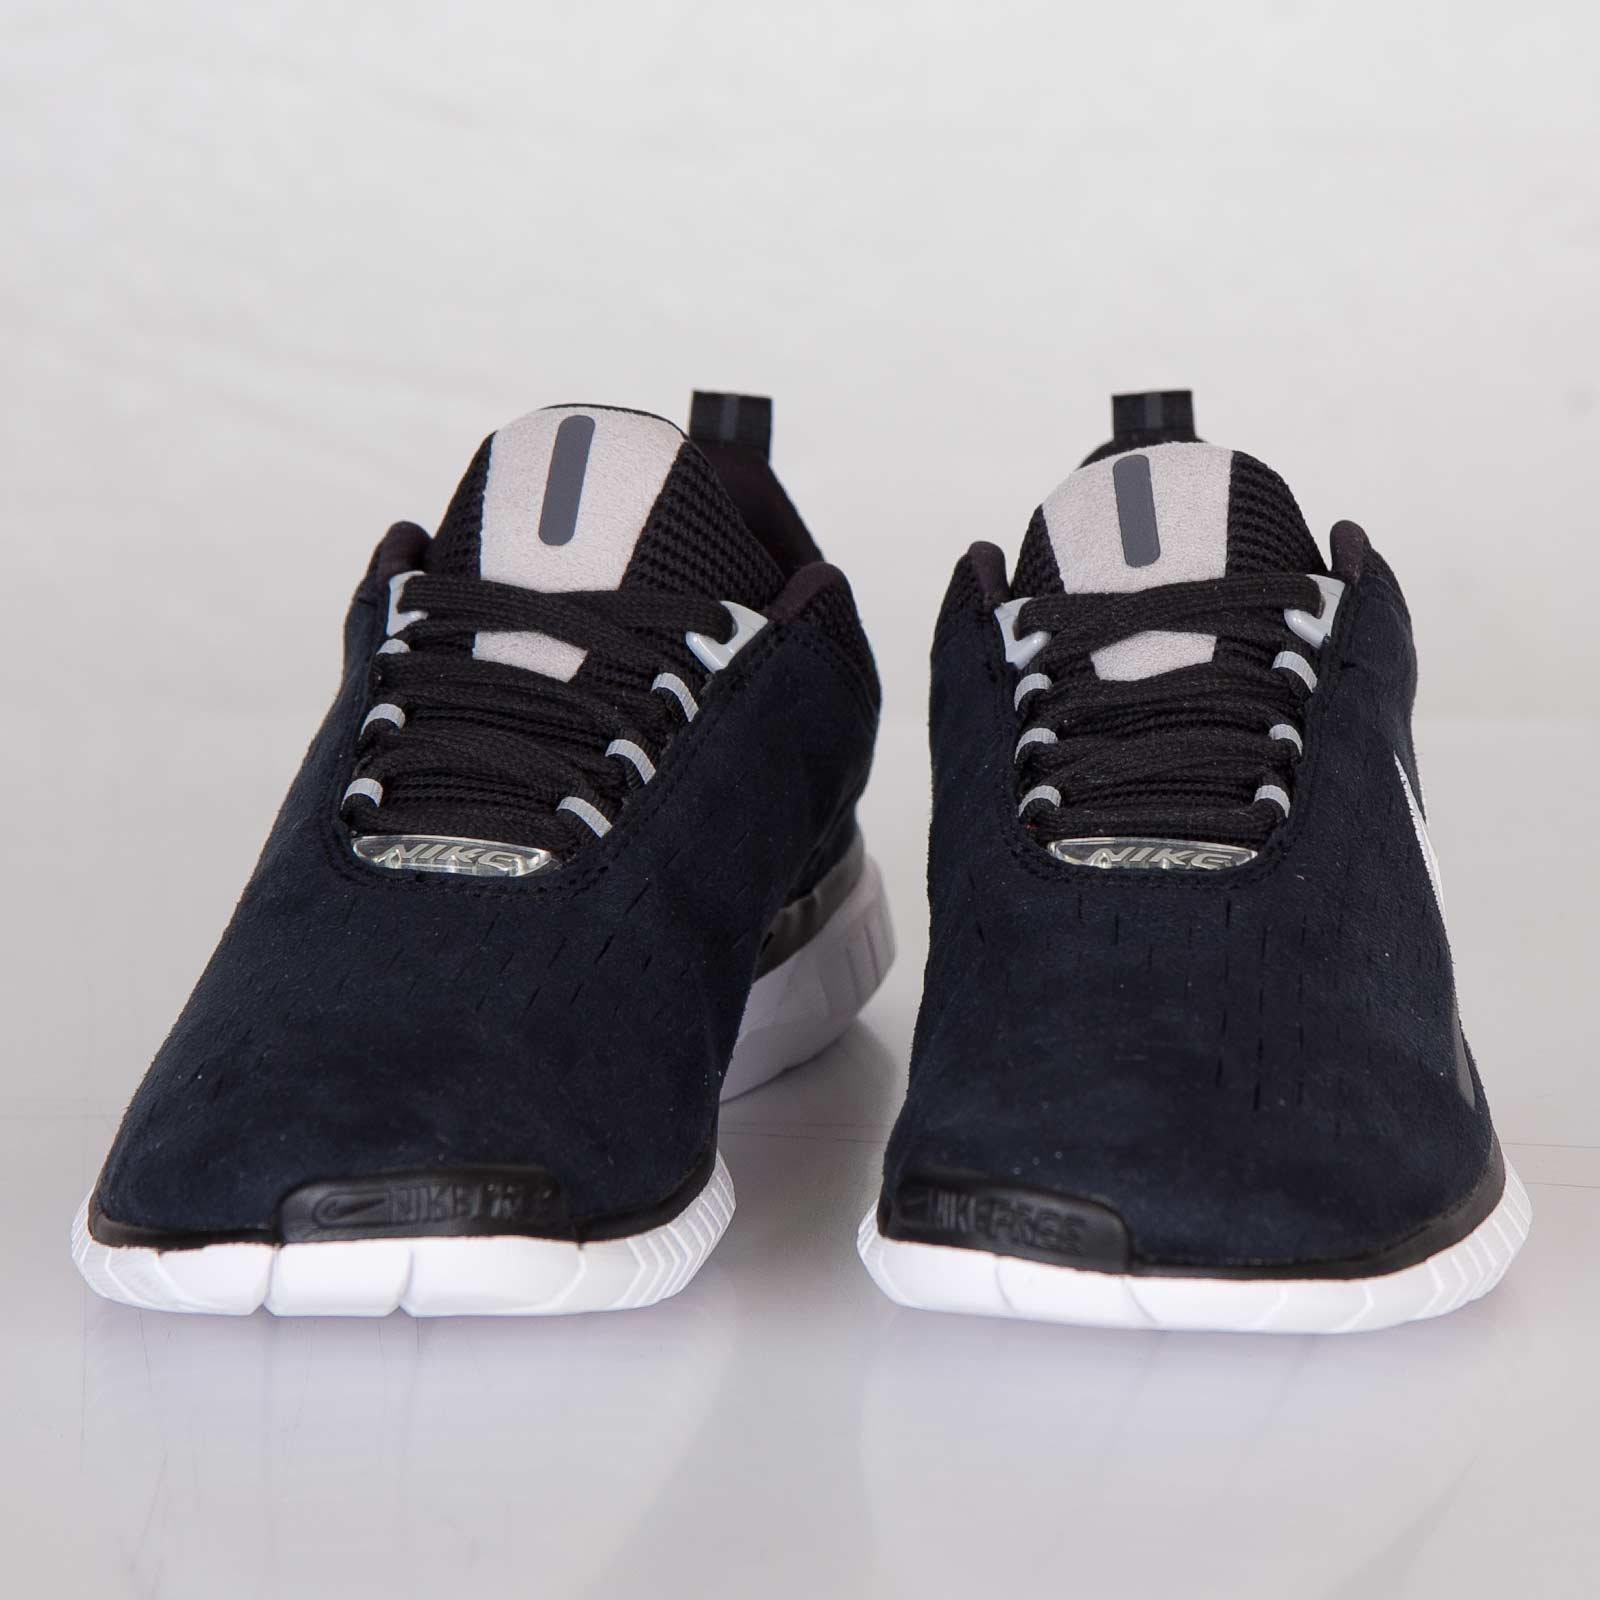 5840a14b5497 Nike Free OG ´14 - 642402-001 - Sneakersnstuff